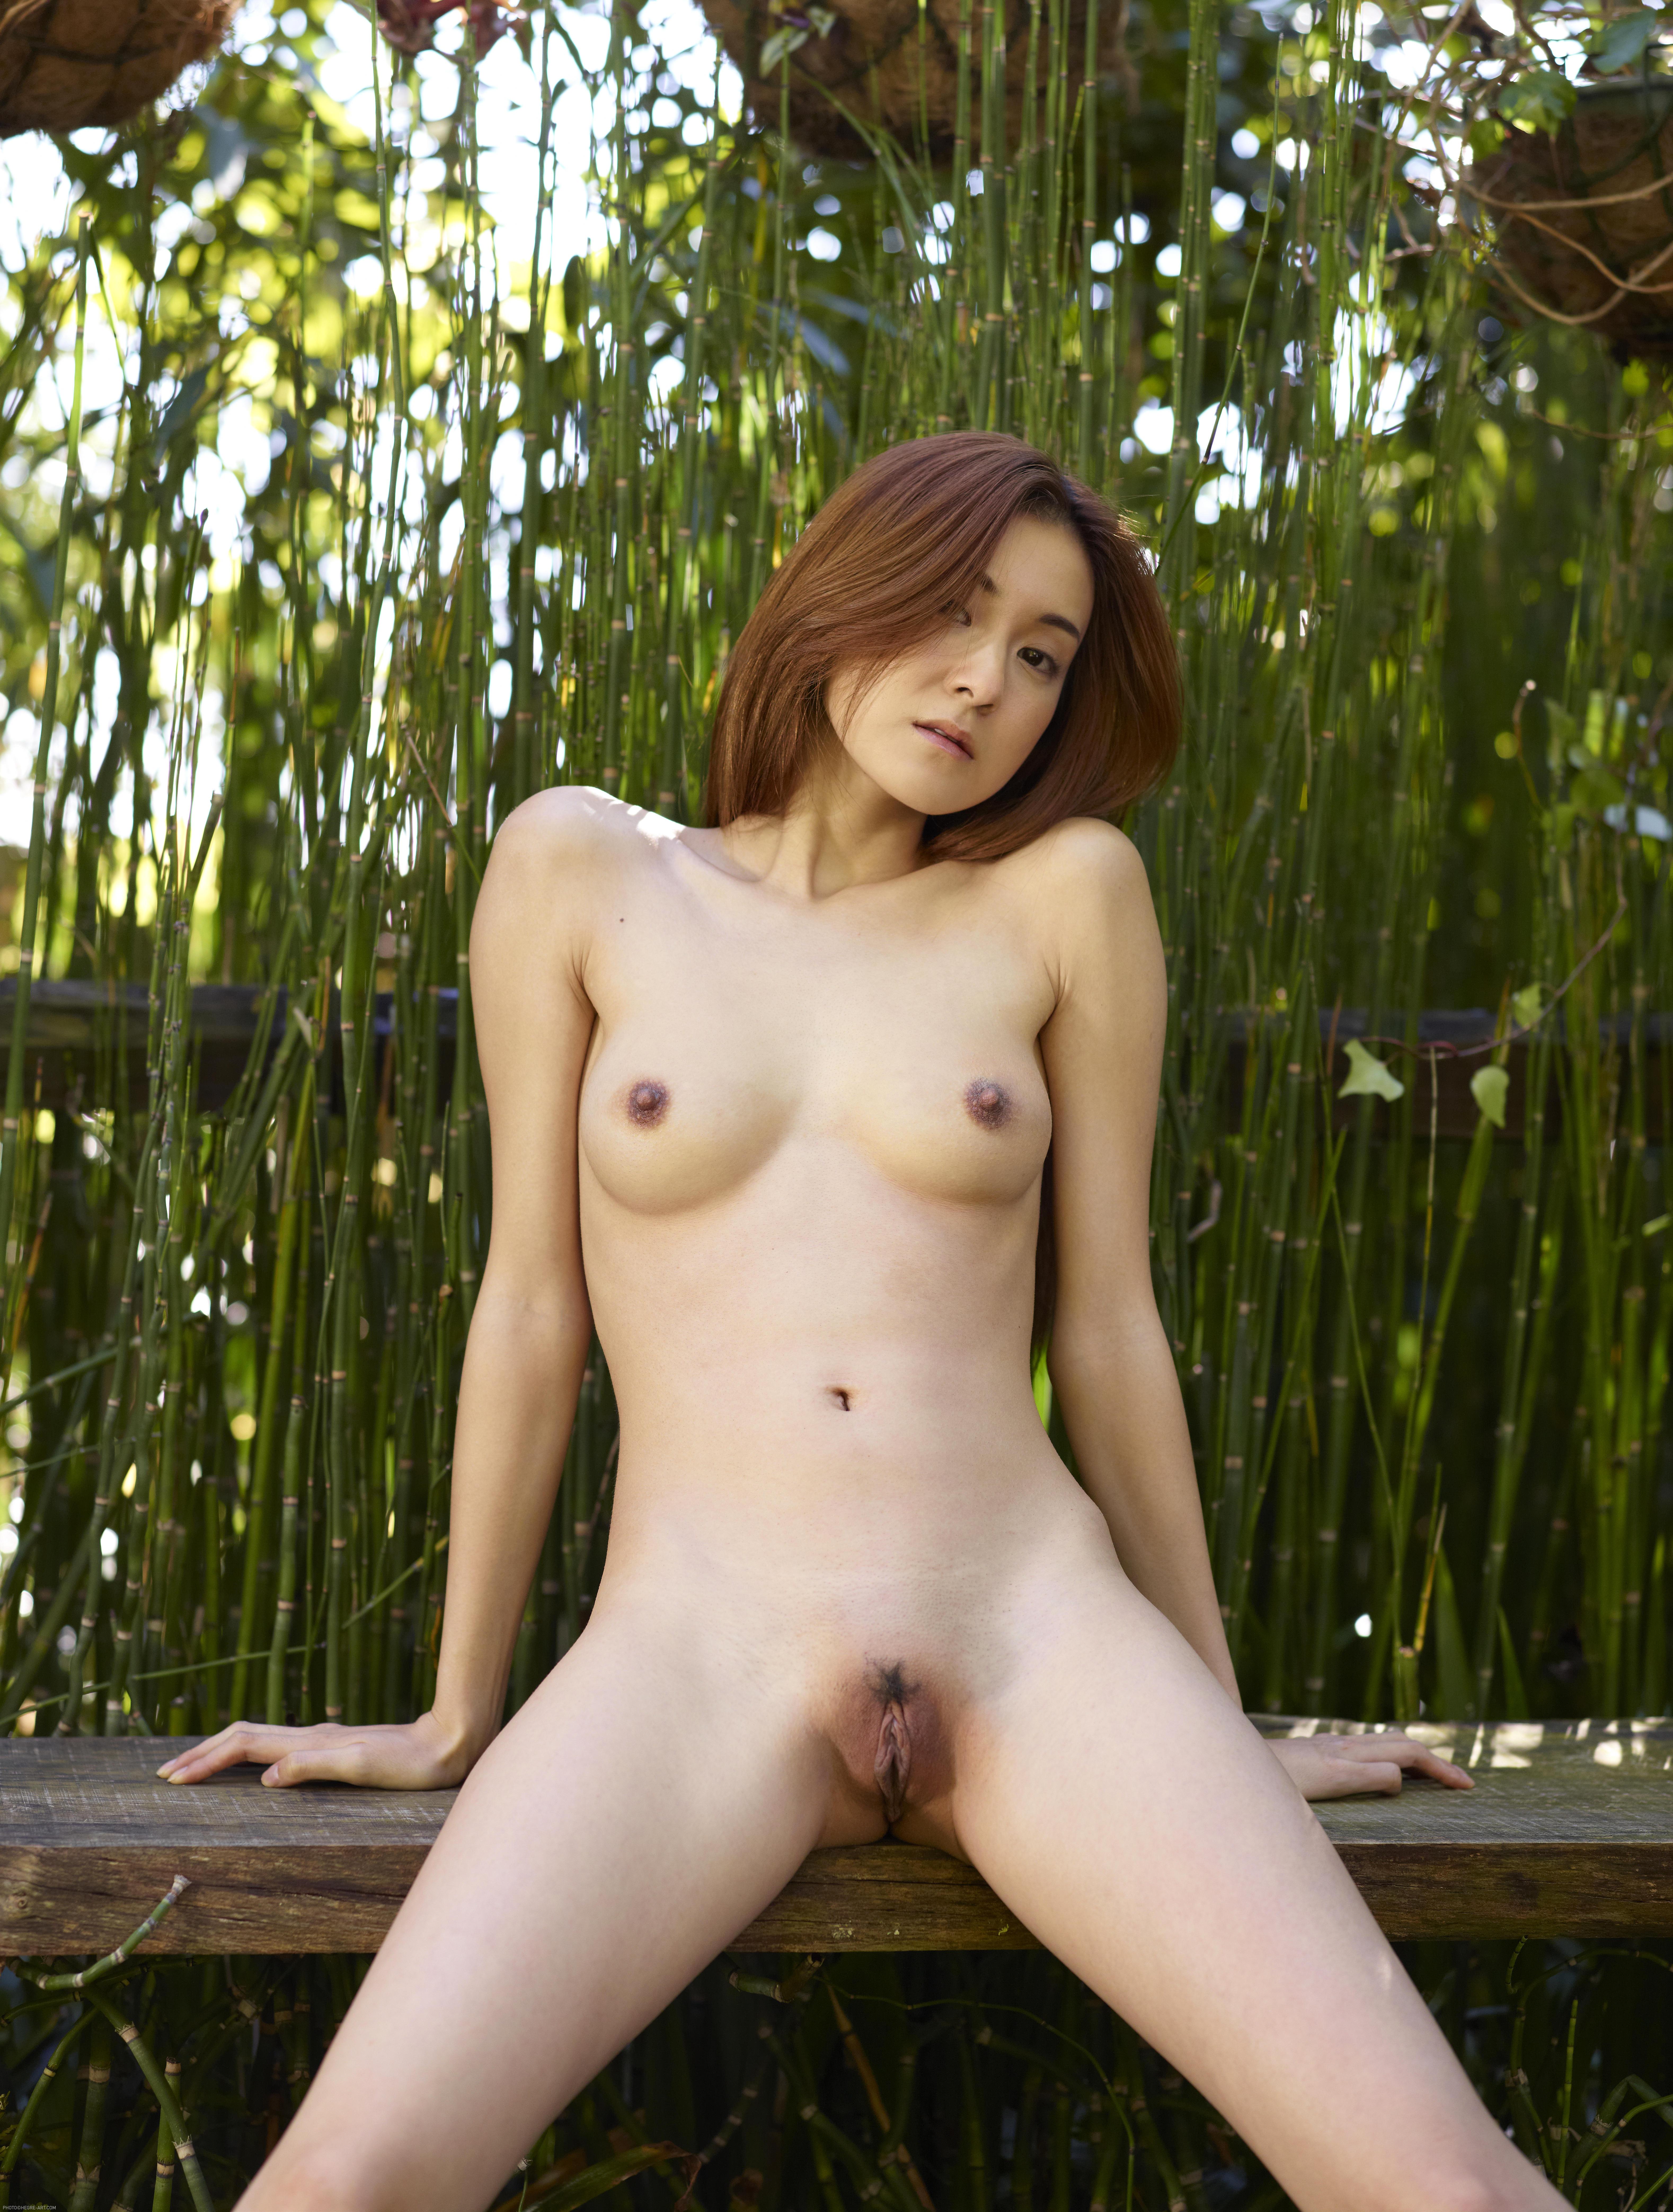 pics of beautiful polish naked full breasted girls